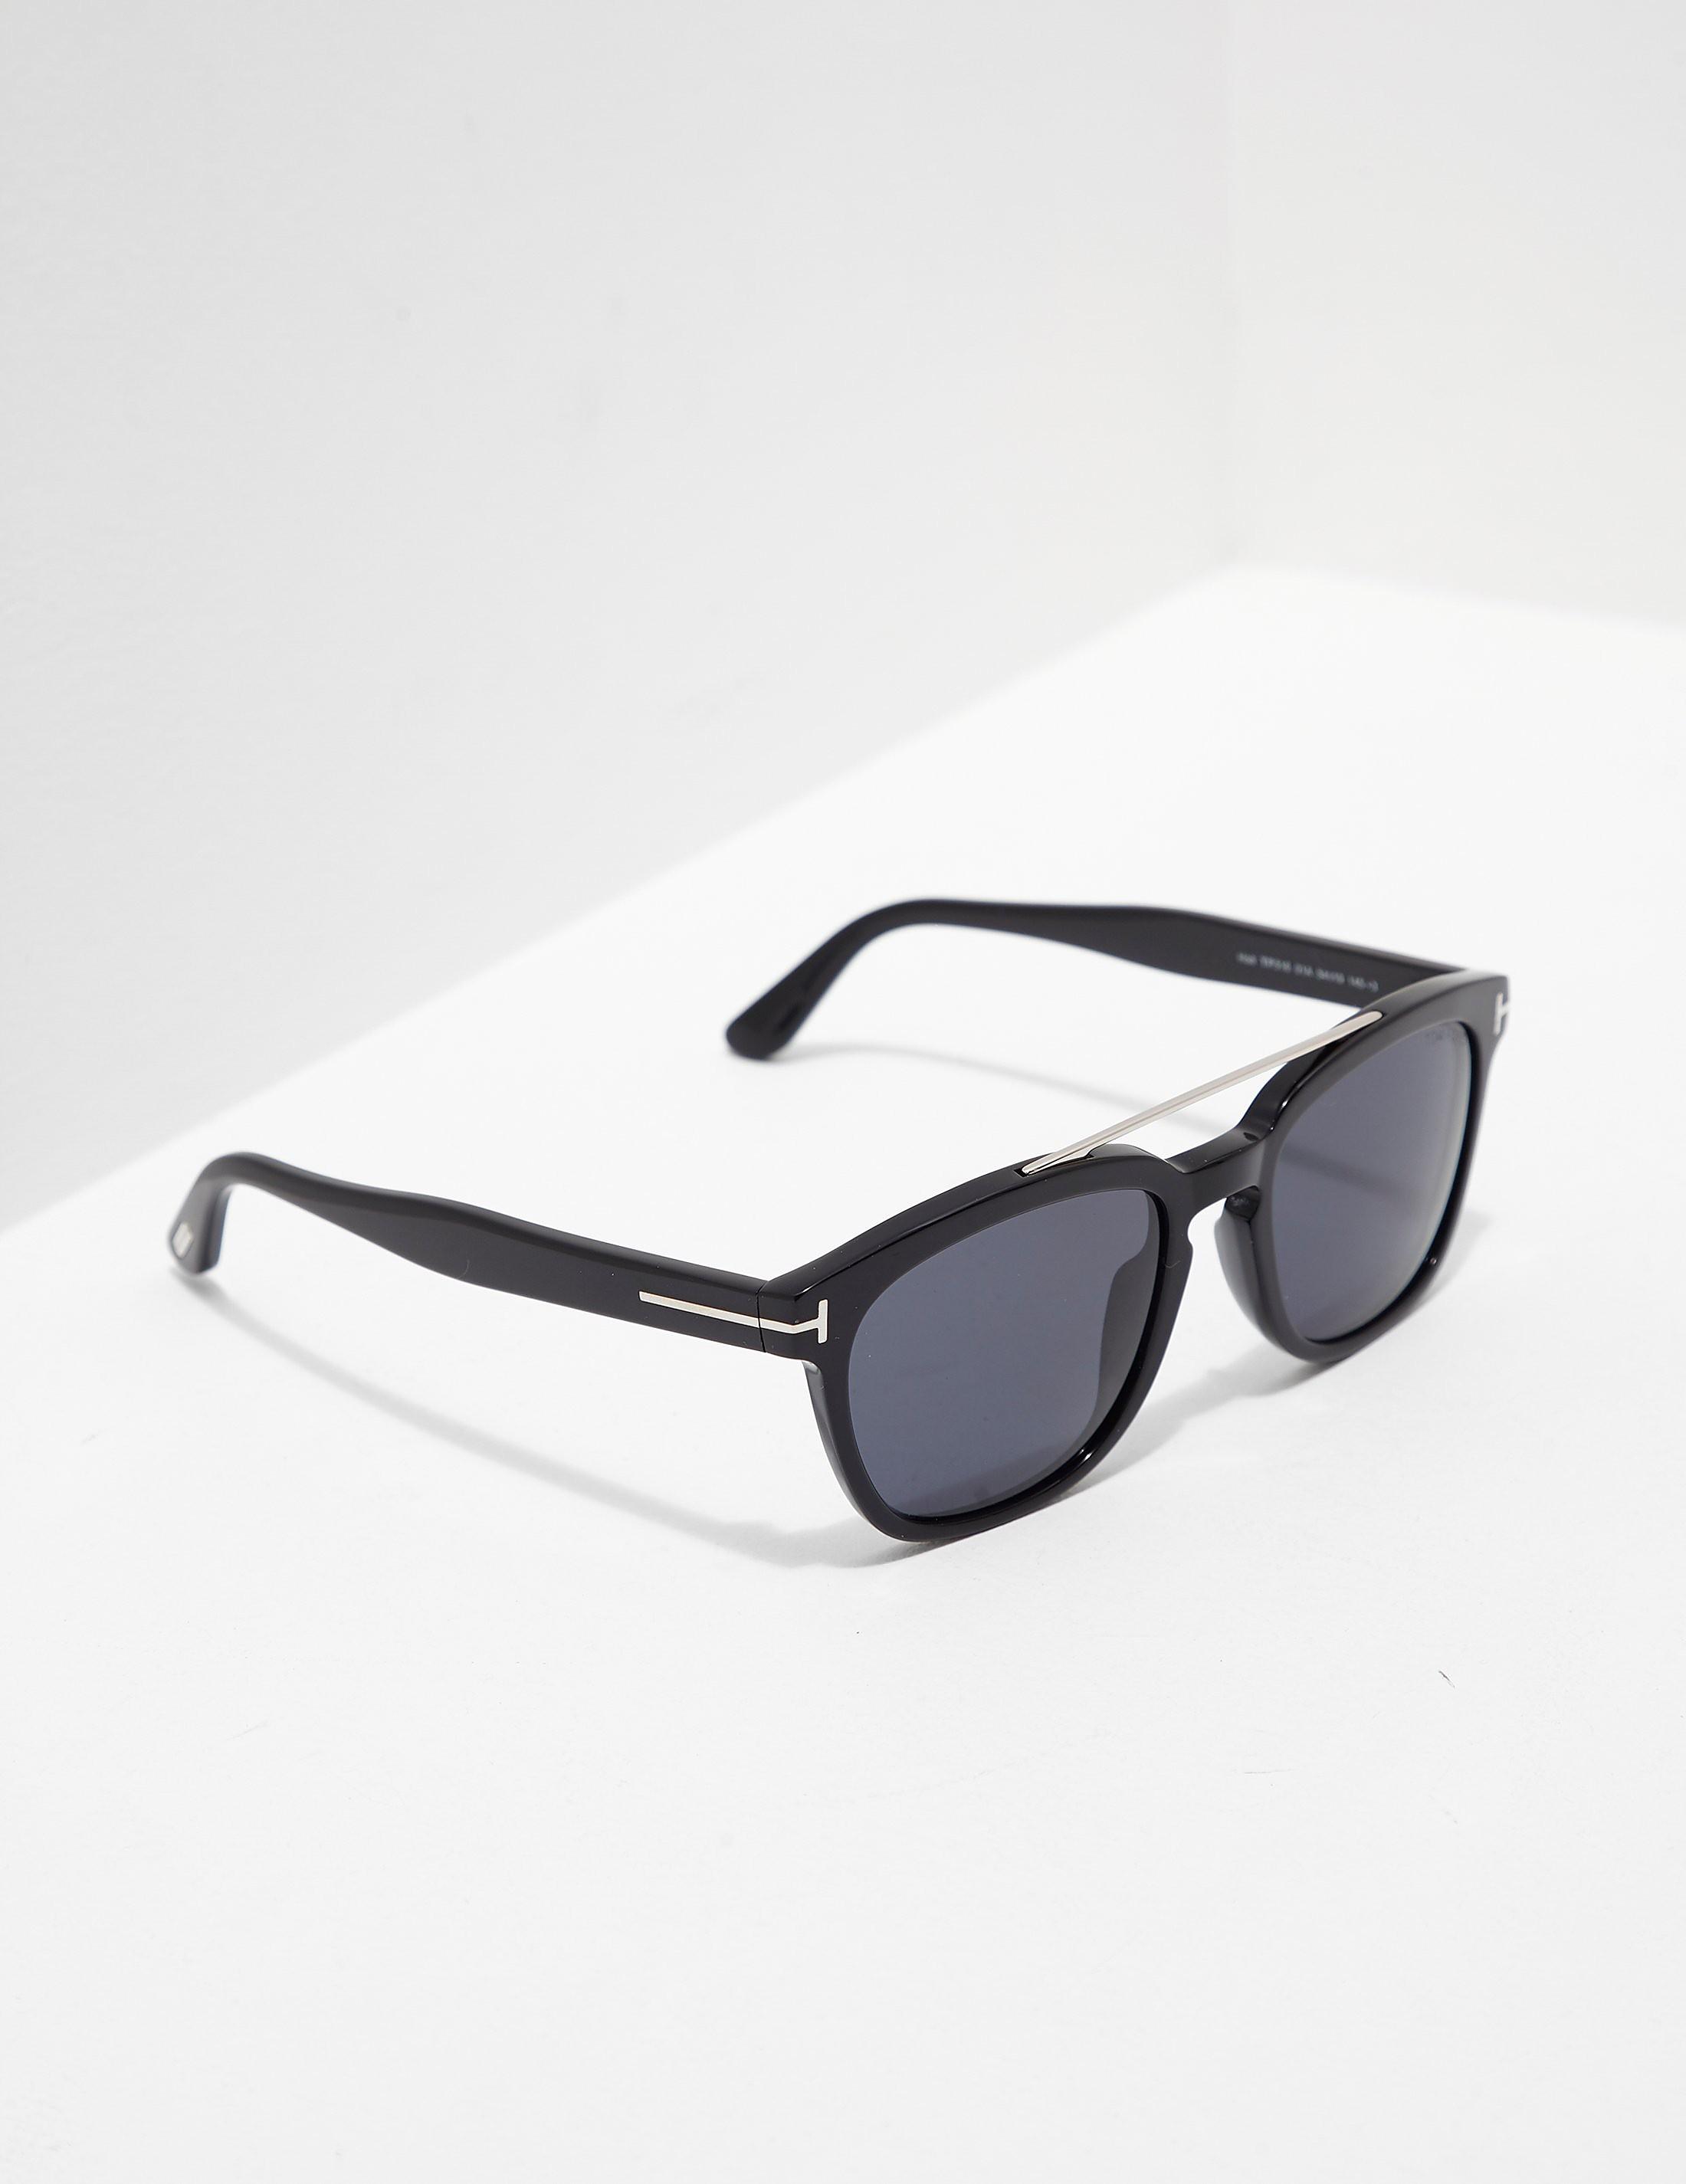 TOM FORD Holt Sunglasses